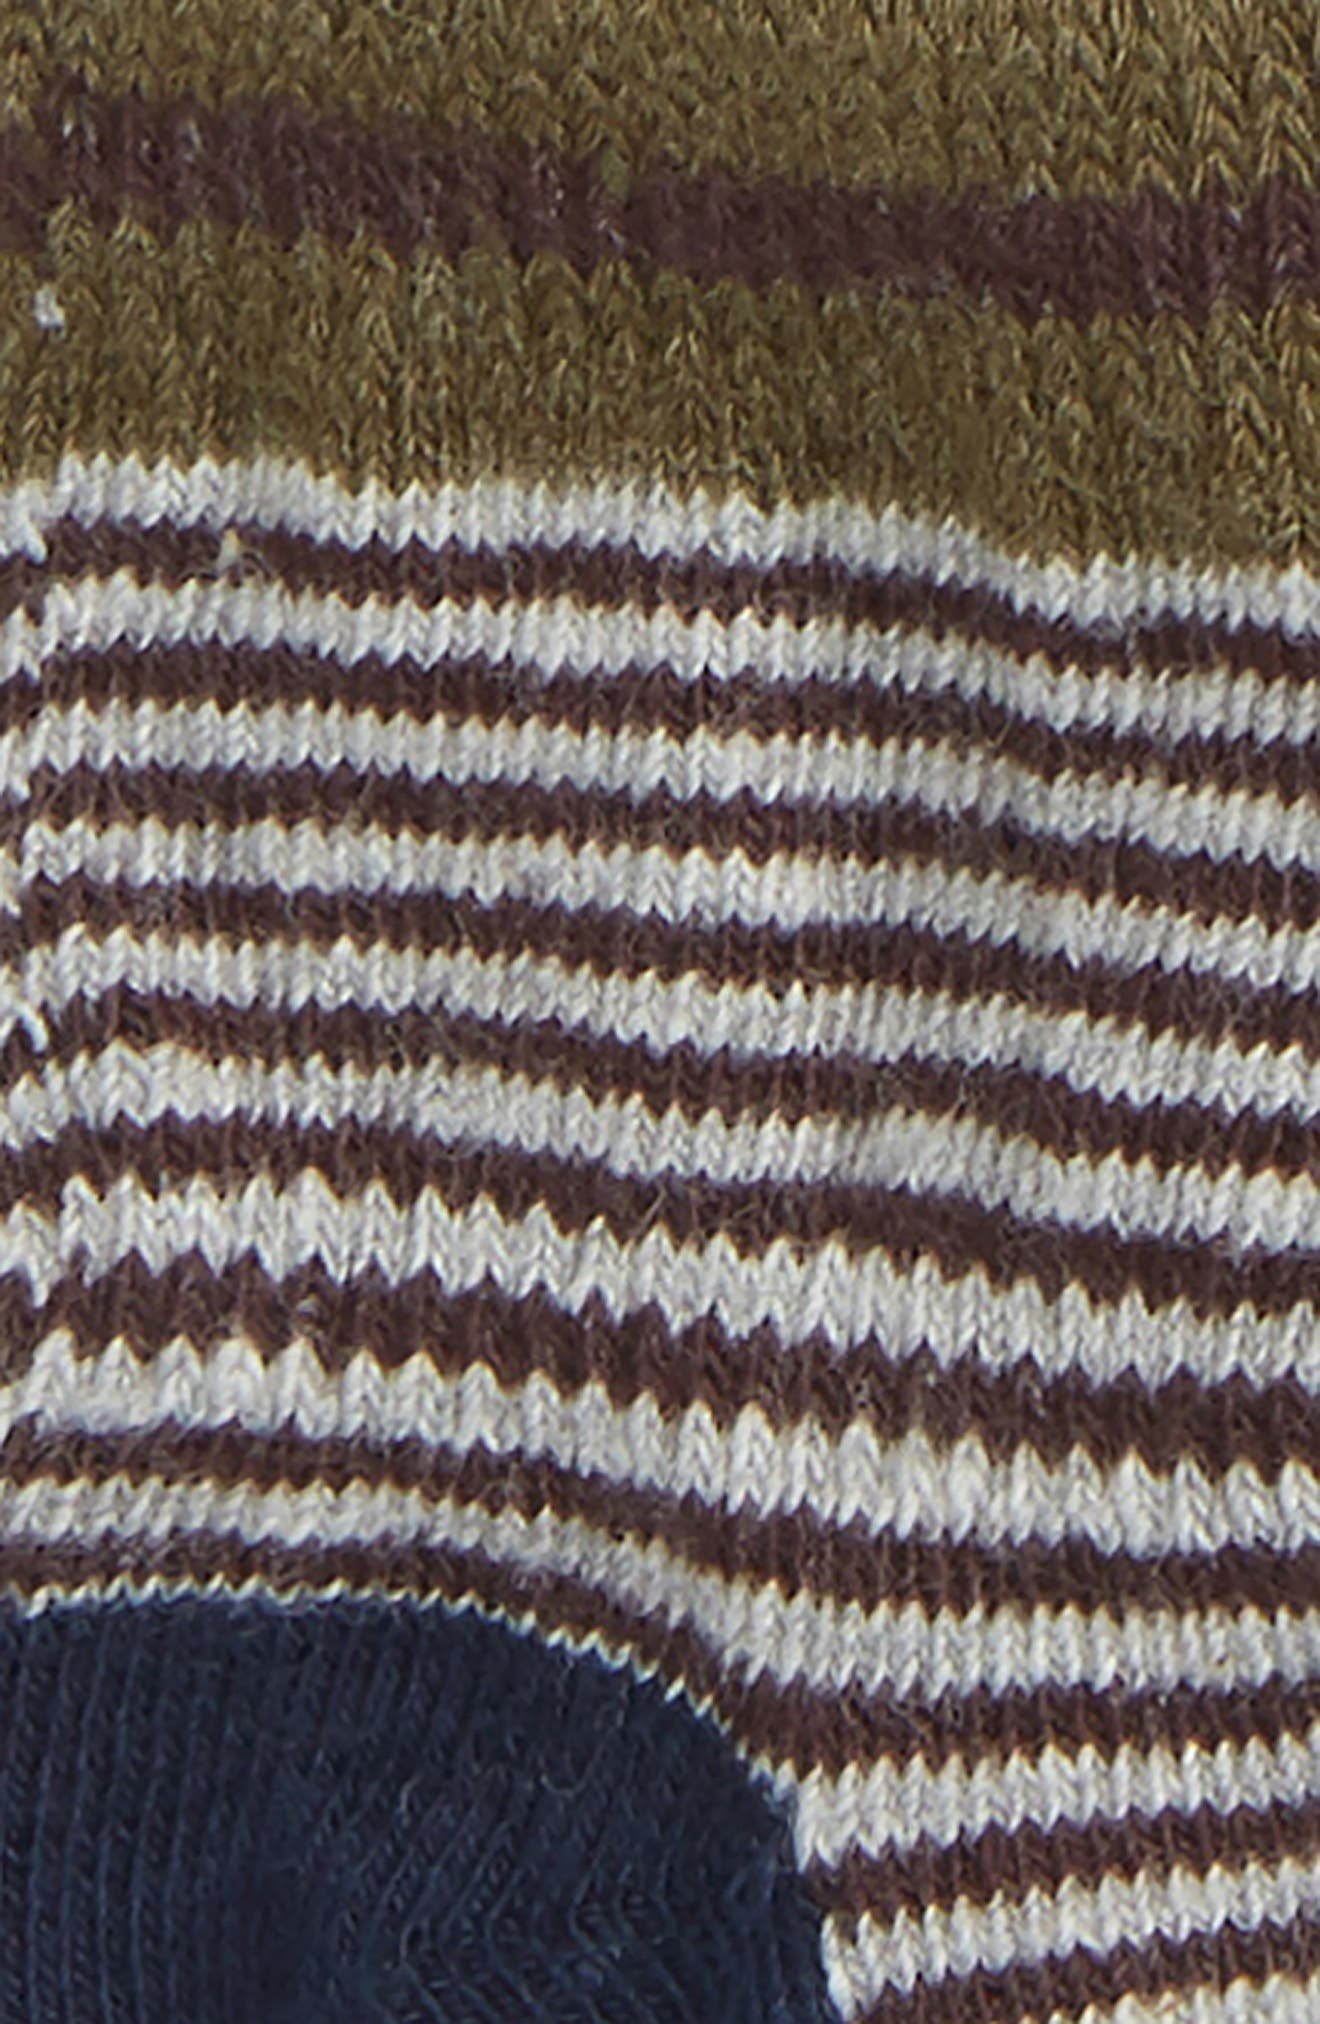 3-Pack Crew Socks,                             Alternate thumbnail 2, color,                             OLIVE/ NAVY/ GREY